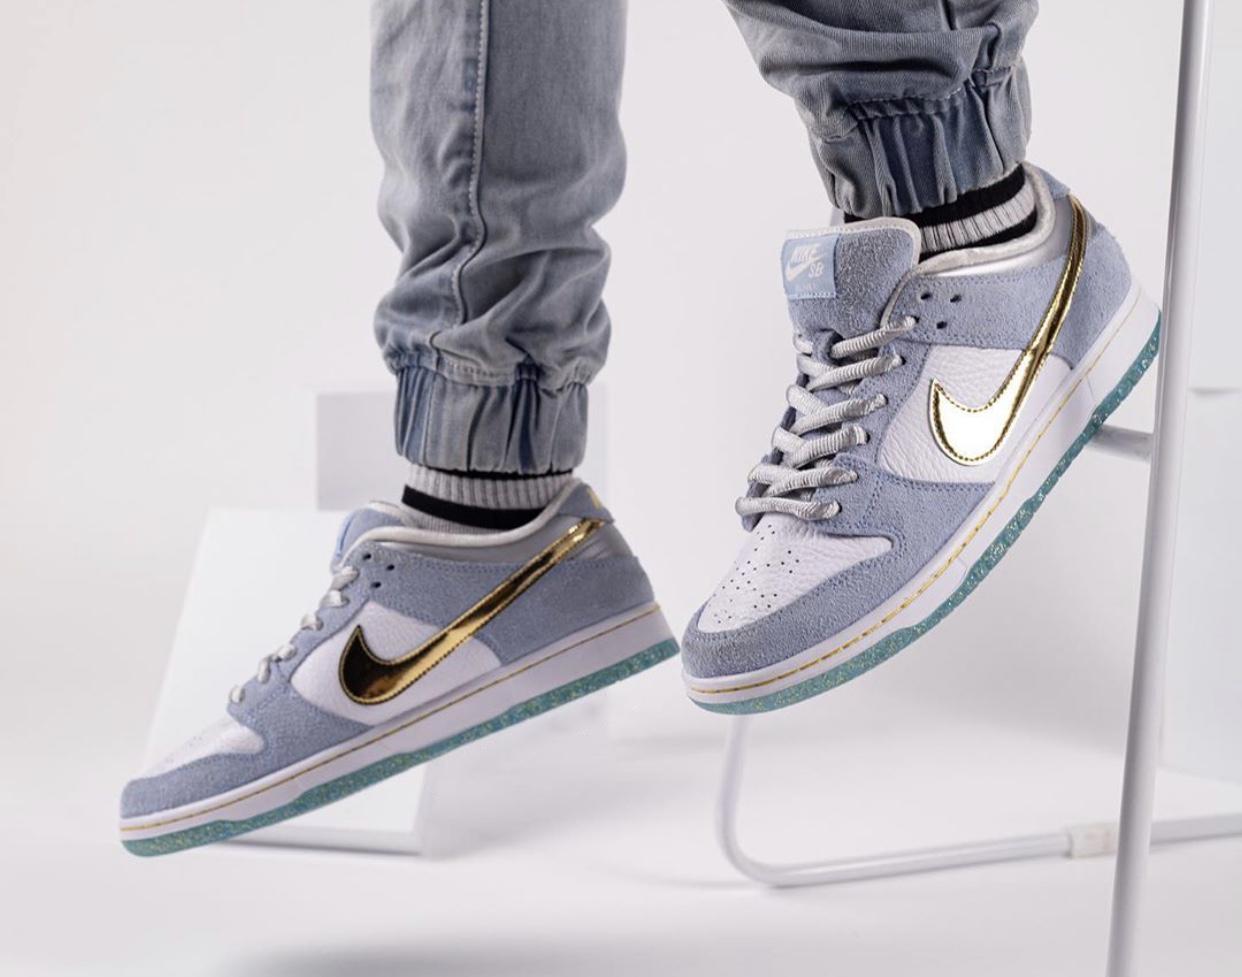 Sean-Cliver-Nike-SB-Dunk-Low-DC9936-100-wearing6